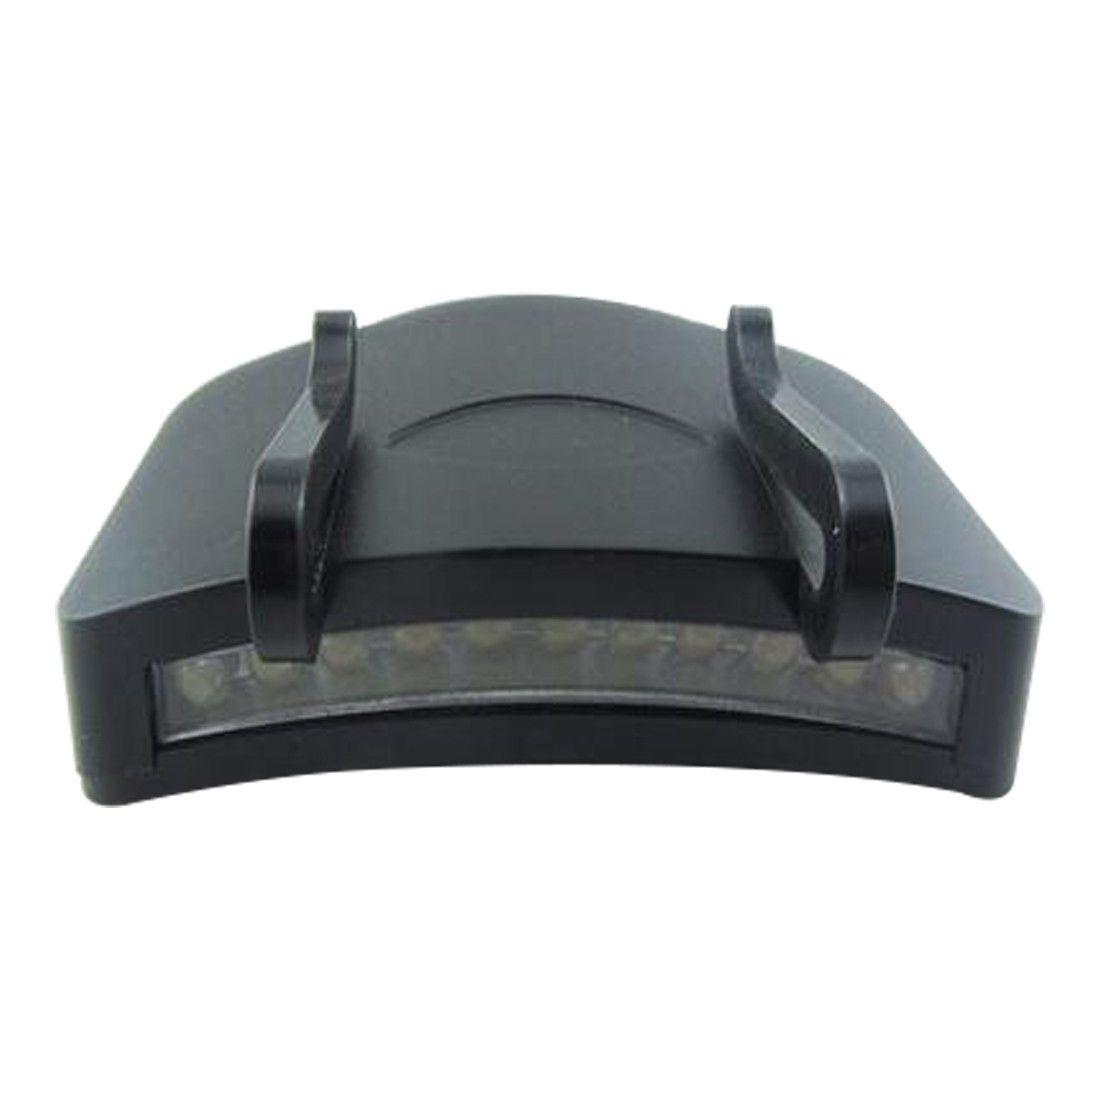 Super Bright 11 LED cap light Fishing Headlight HeadLamp head Flashlight IJ